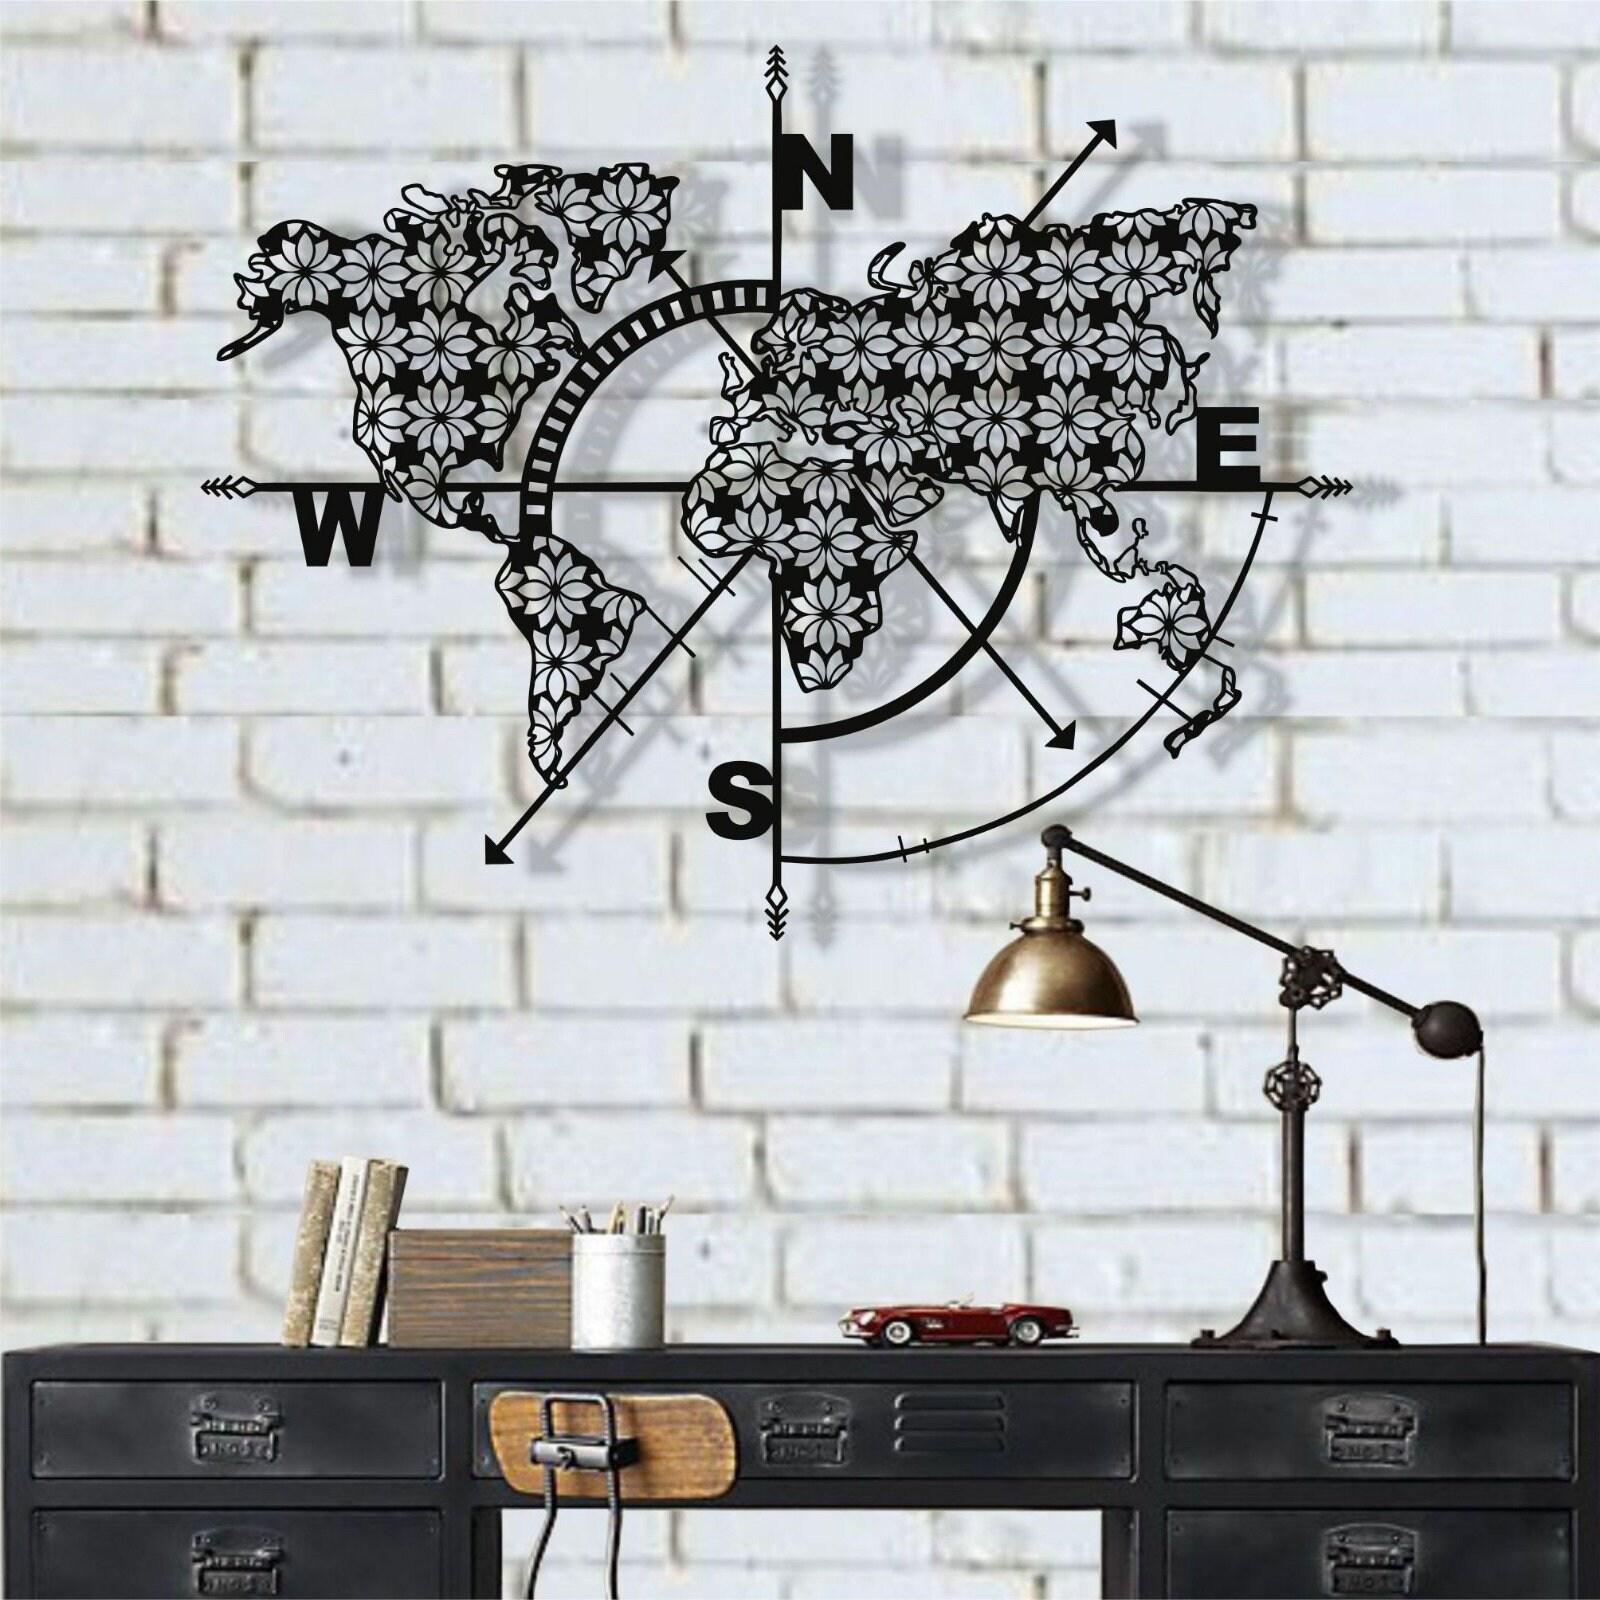 Metal World Map Wall Art Compass Flowers Metal Wall Decor Metal Sign Metal Wall Art Wall Hangings Interior Decoration Housewarming Gift